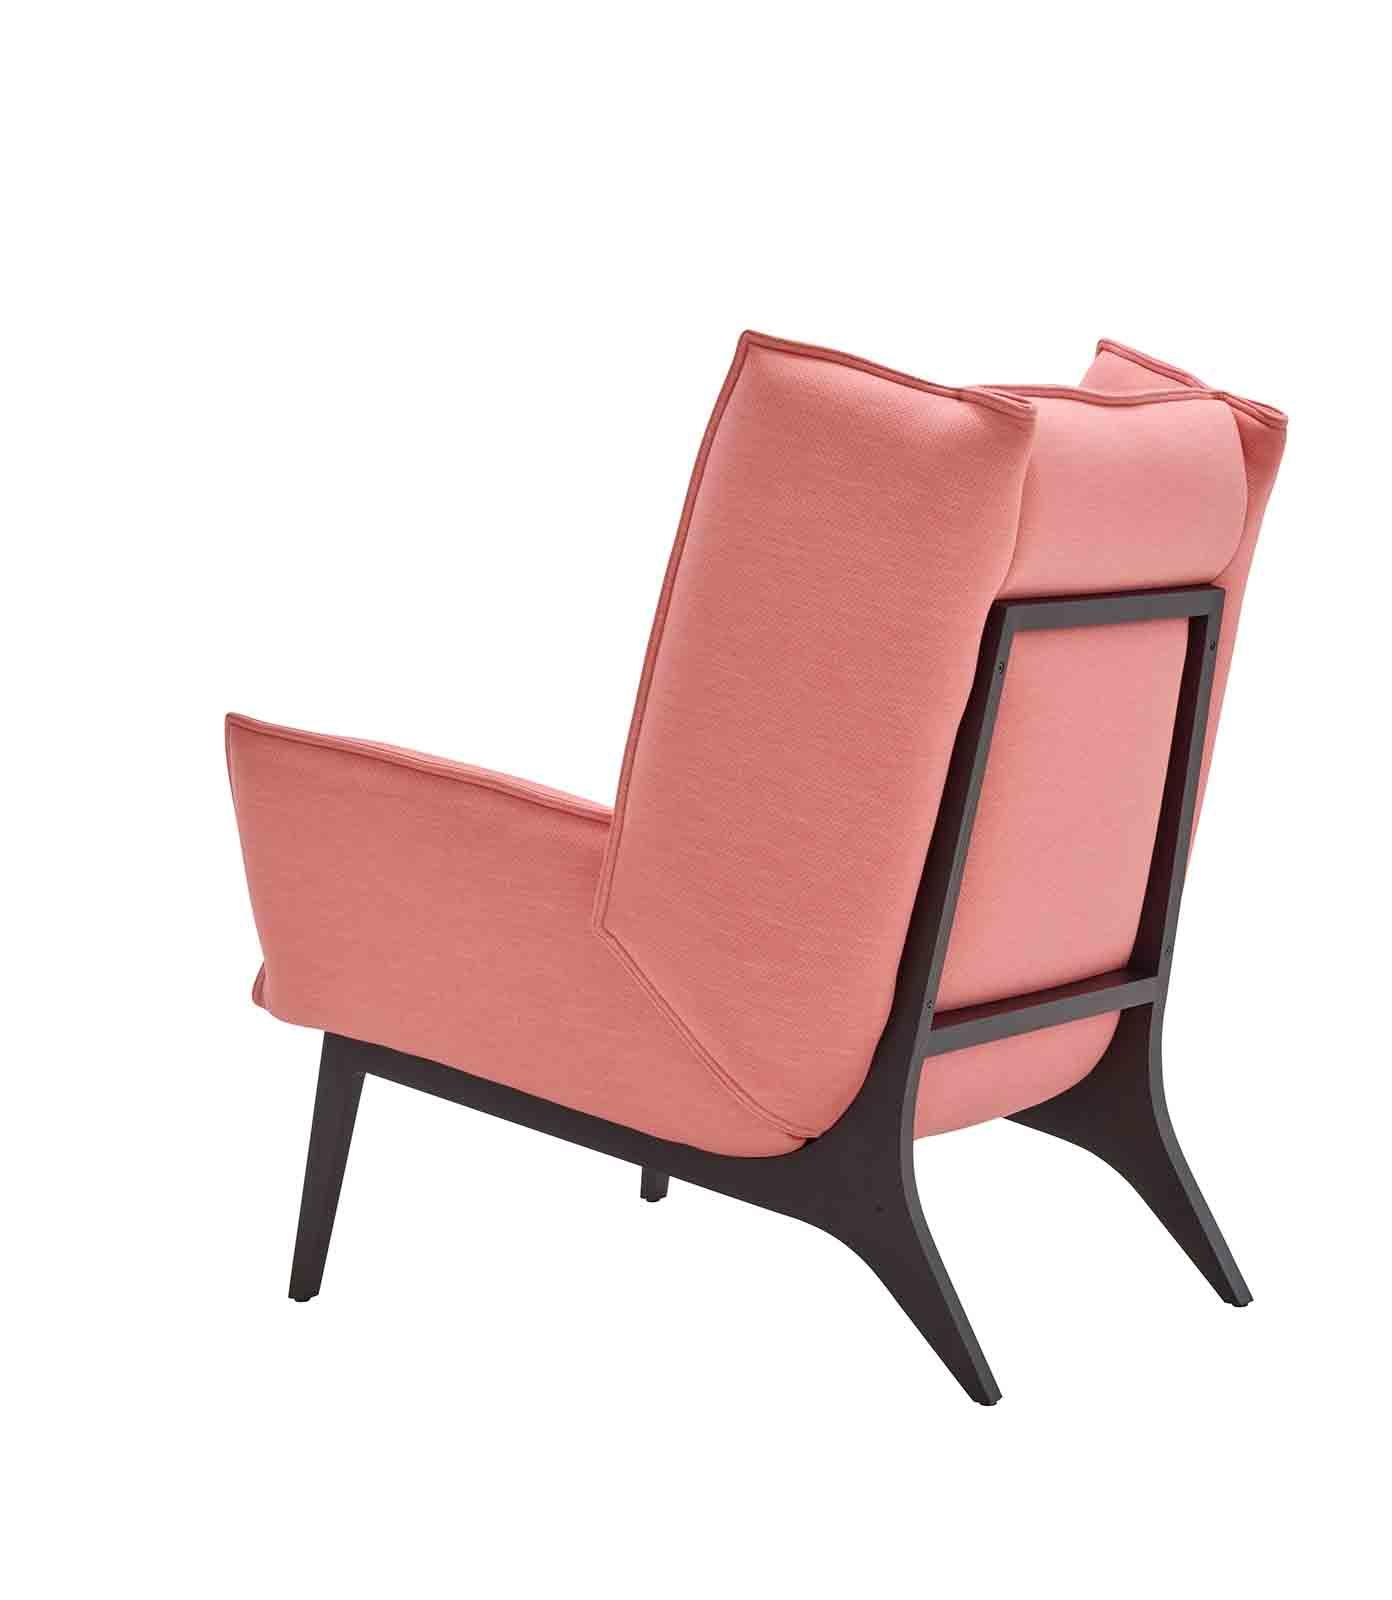 'TOA' chair, designed by Rémi Bouhaniche for Cinna